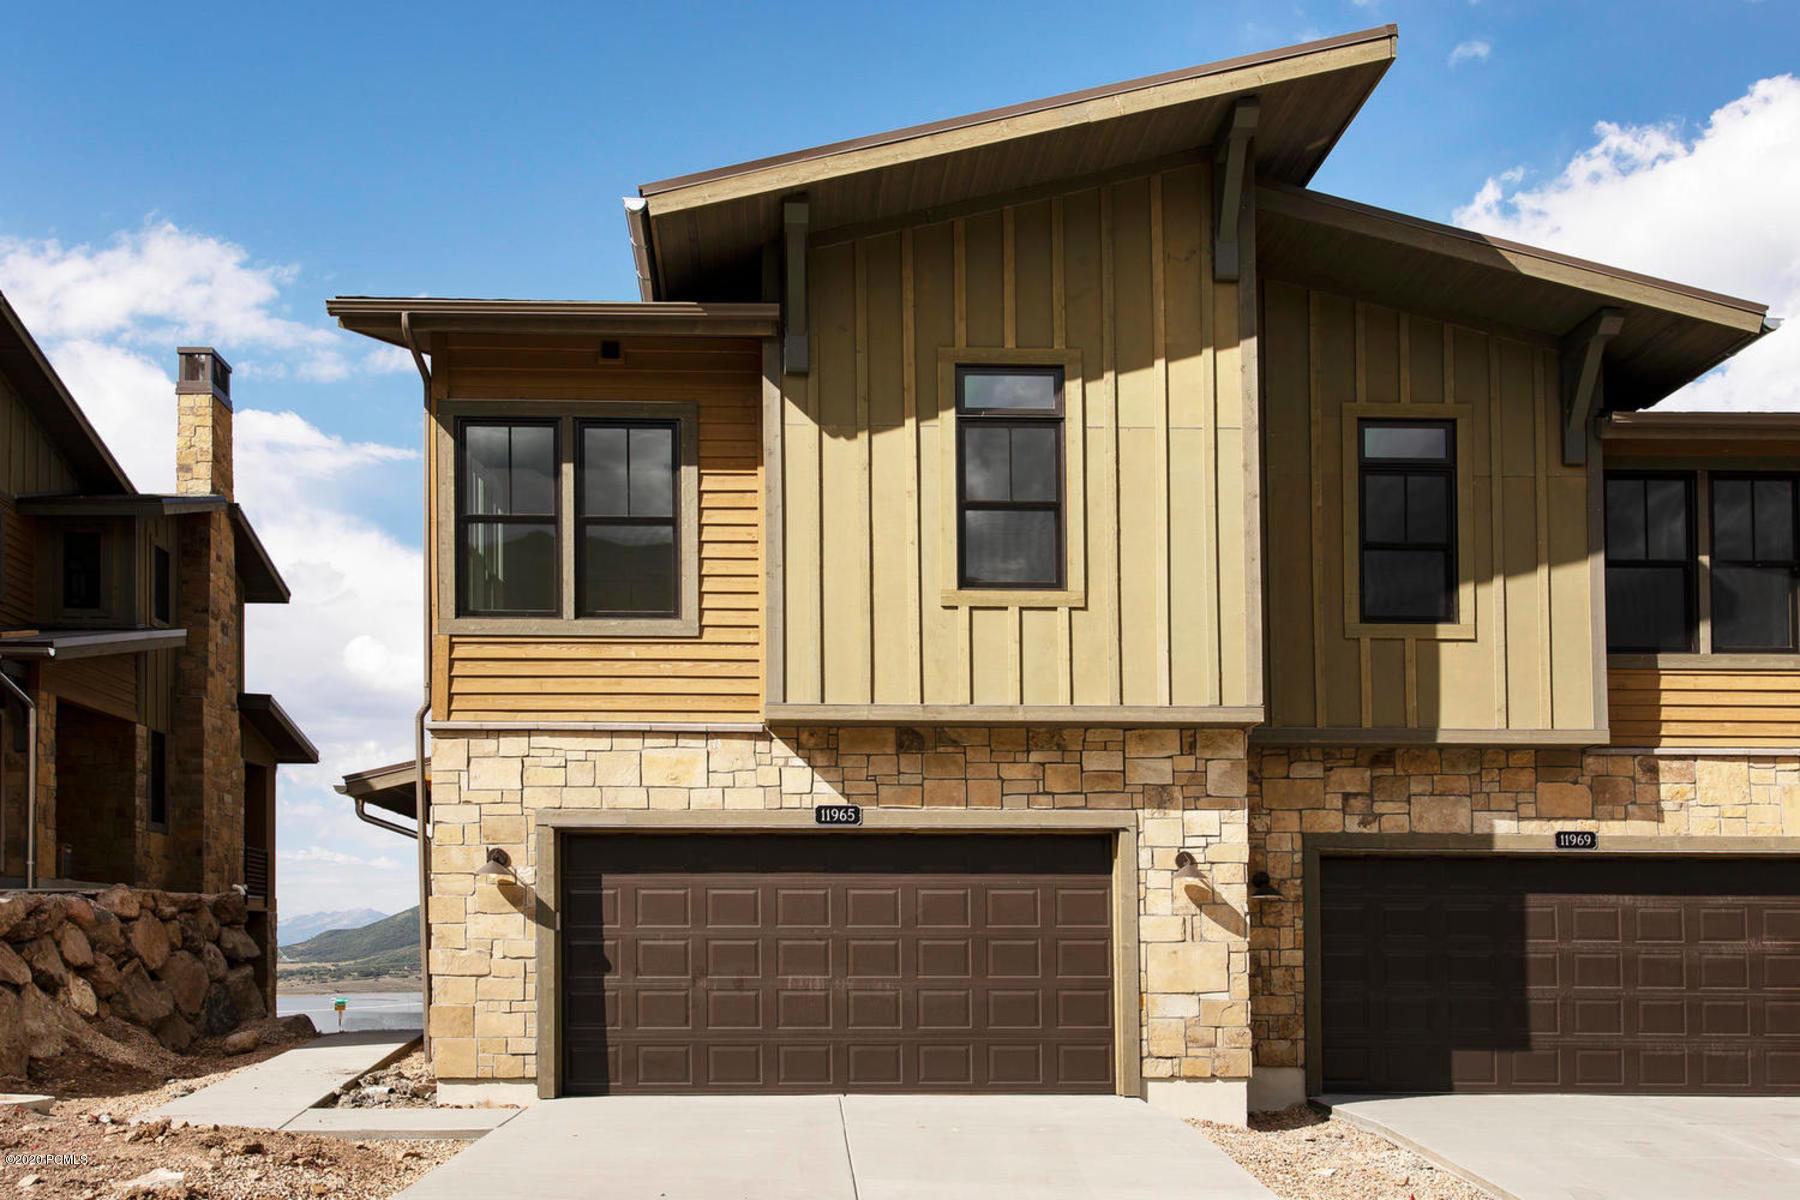 11925 Shoreline Dr, Lot 9, Hideout, Utah 84036, 3 Bedrooms Bedrooms, ,3 BathroomsBathrooms,Condominium,For Sale,Shoreline Dr, Lot 9,12001816